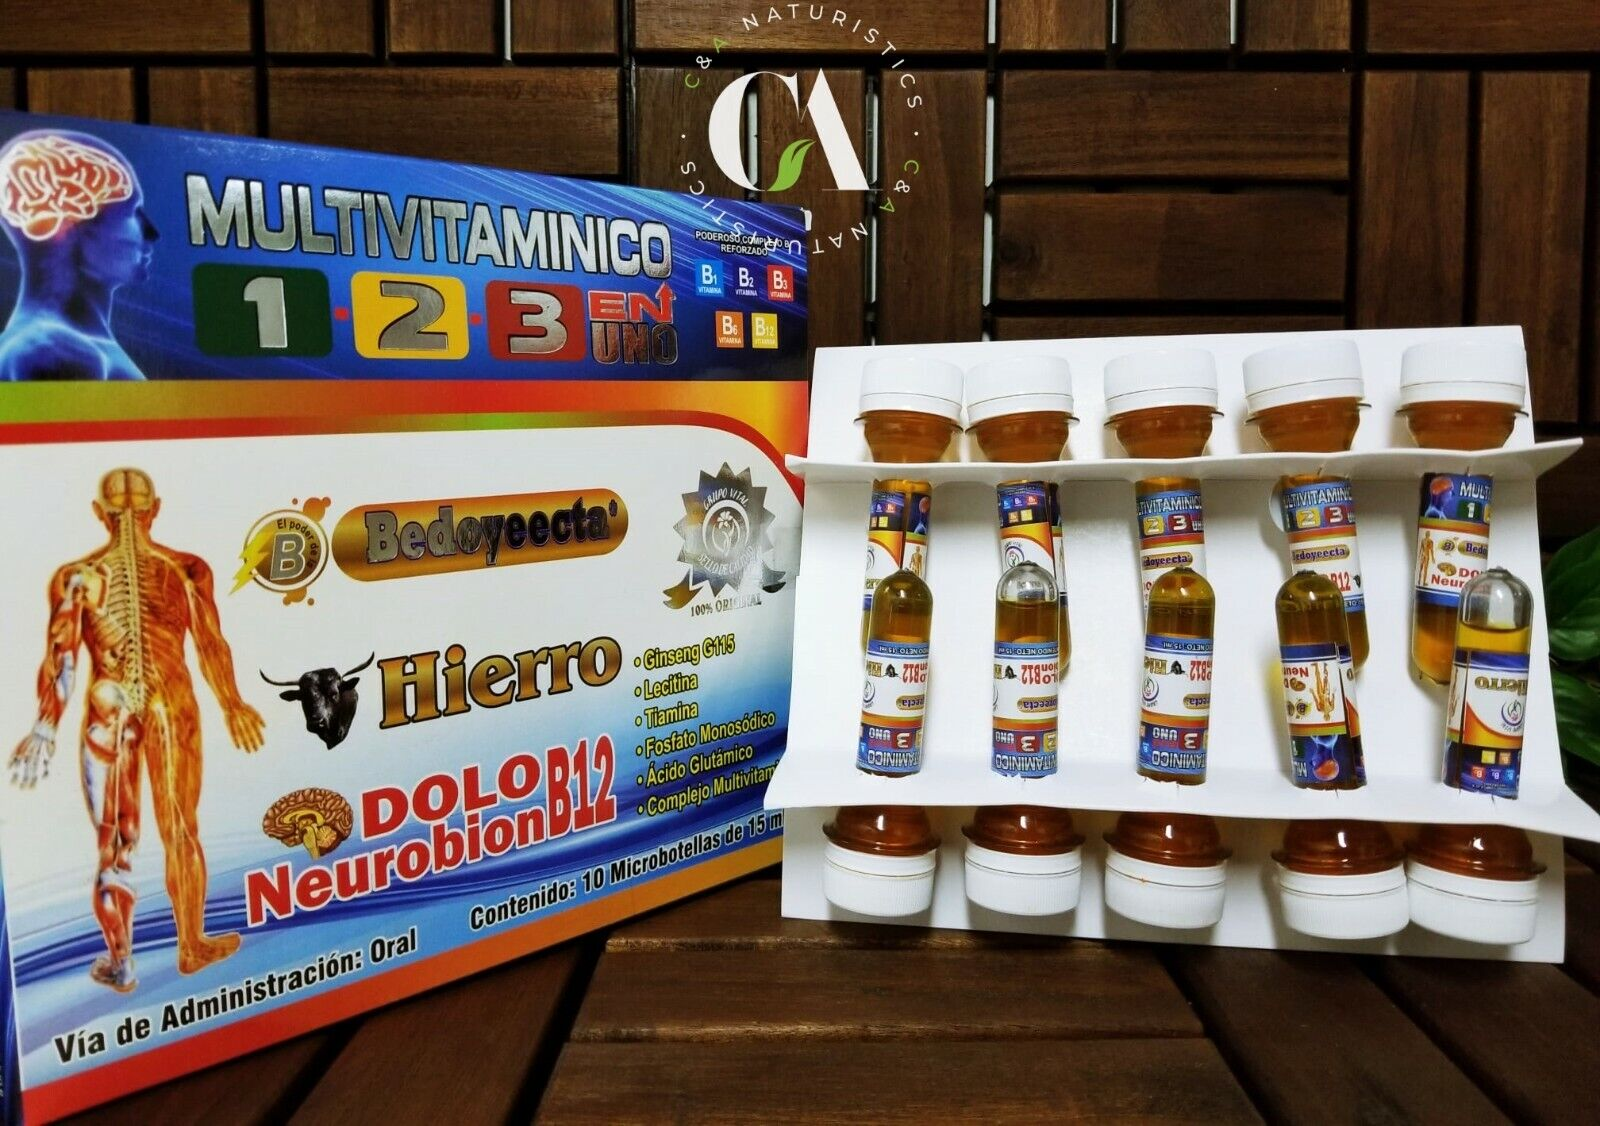 Multivitaminico 1-2-3 Bedoyeecta* Hierro* & DoloNeurobionB12* (10 Microbotellas)